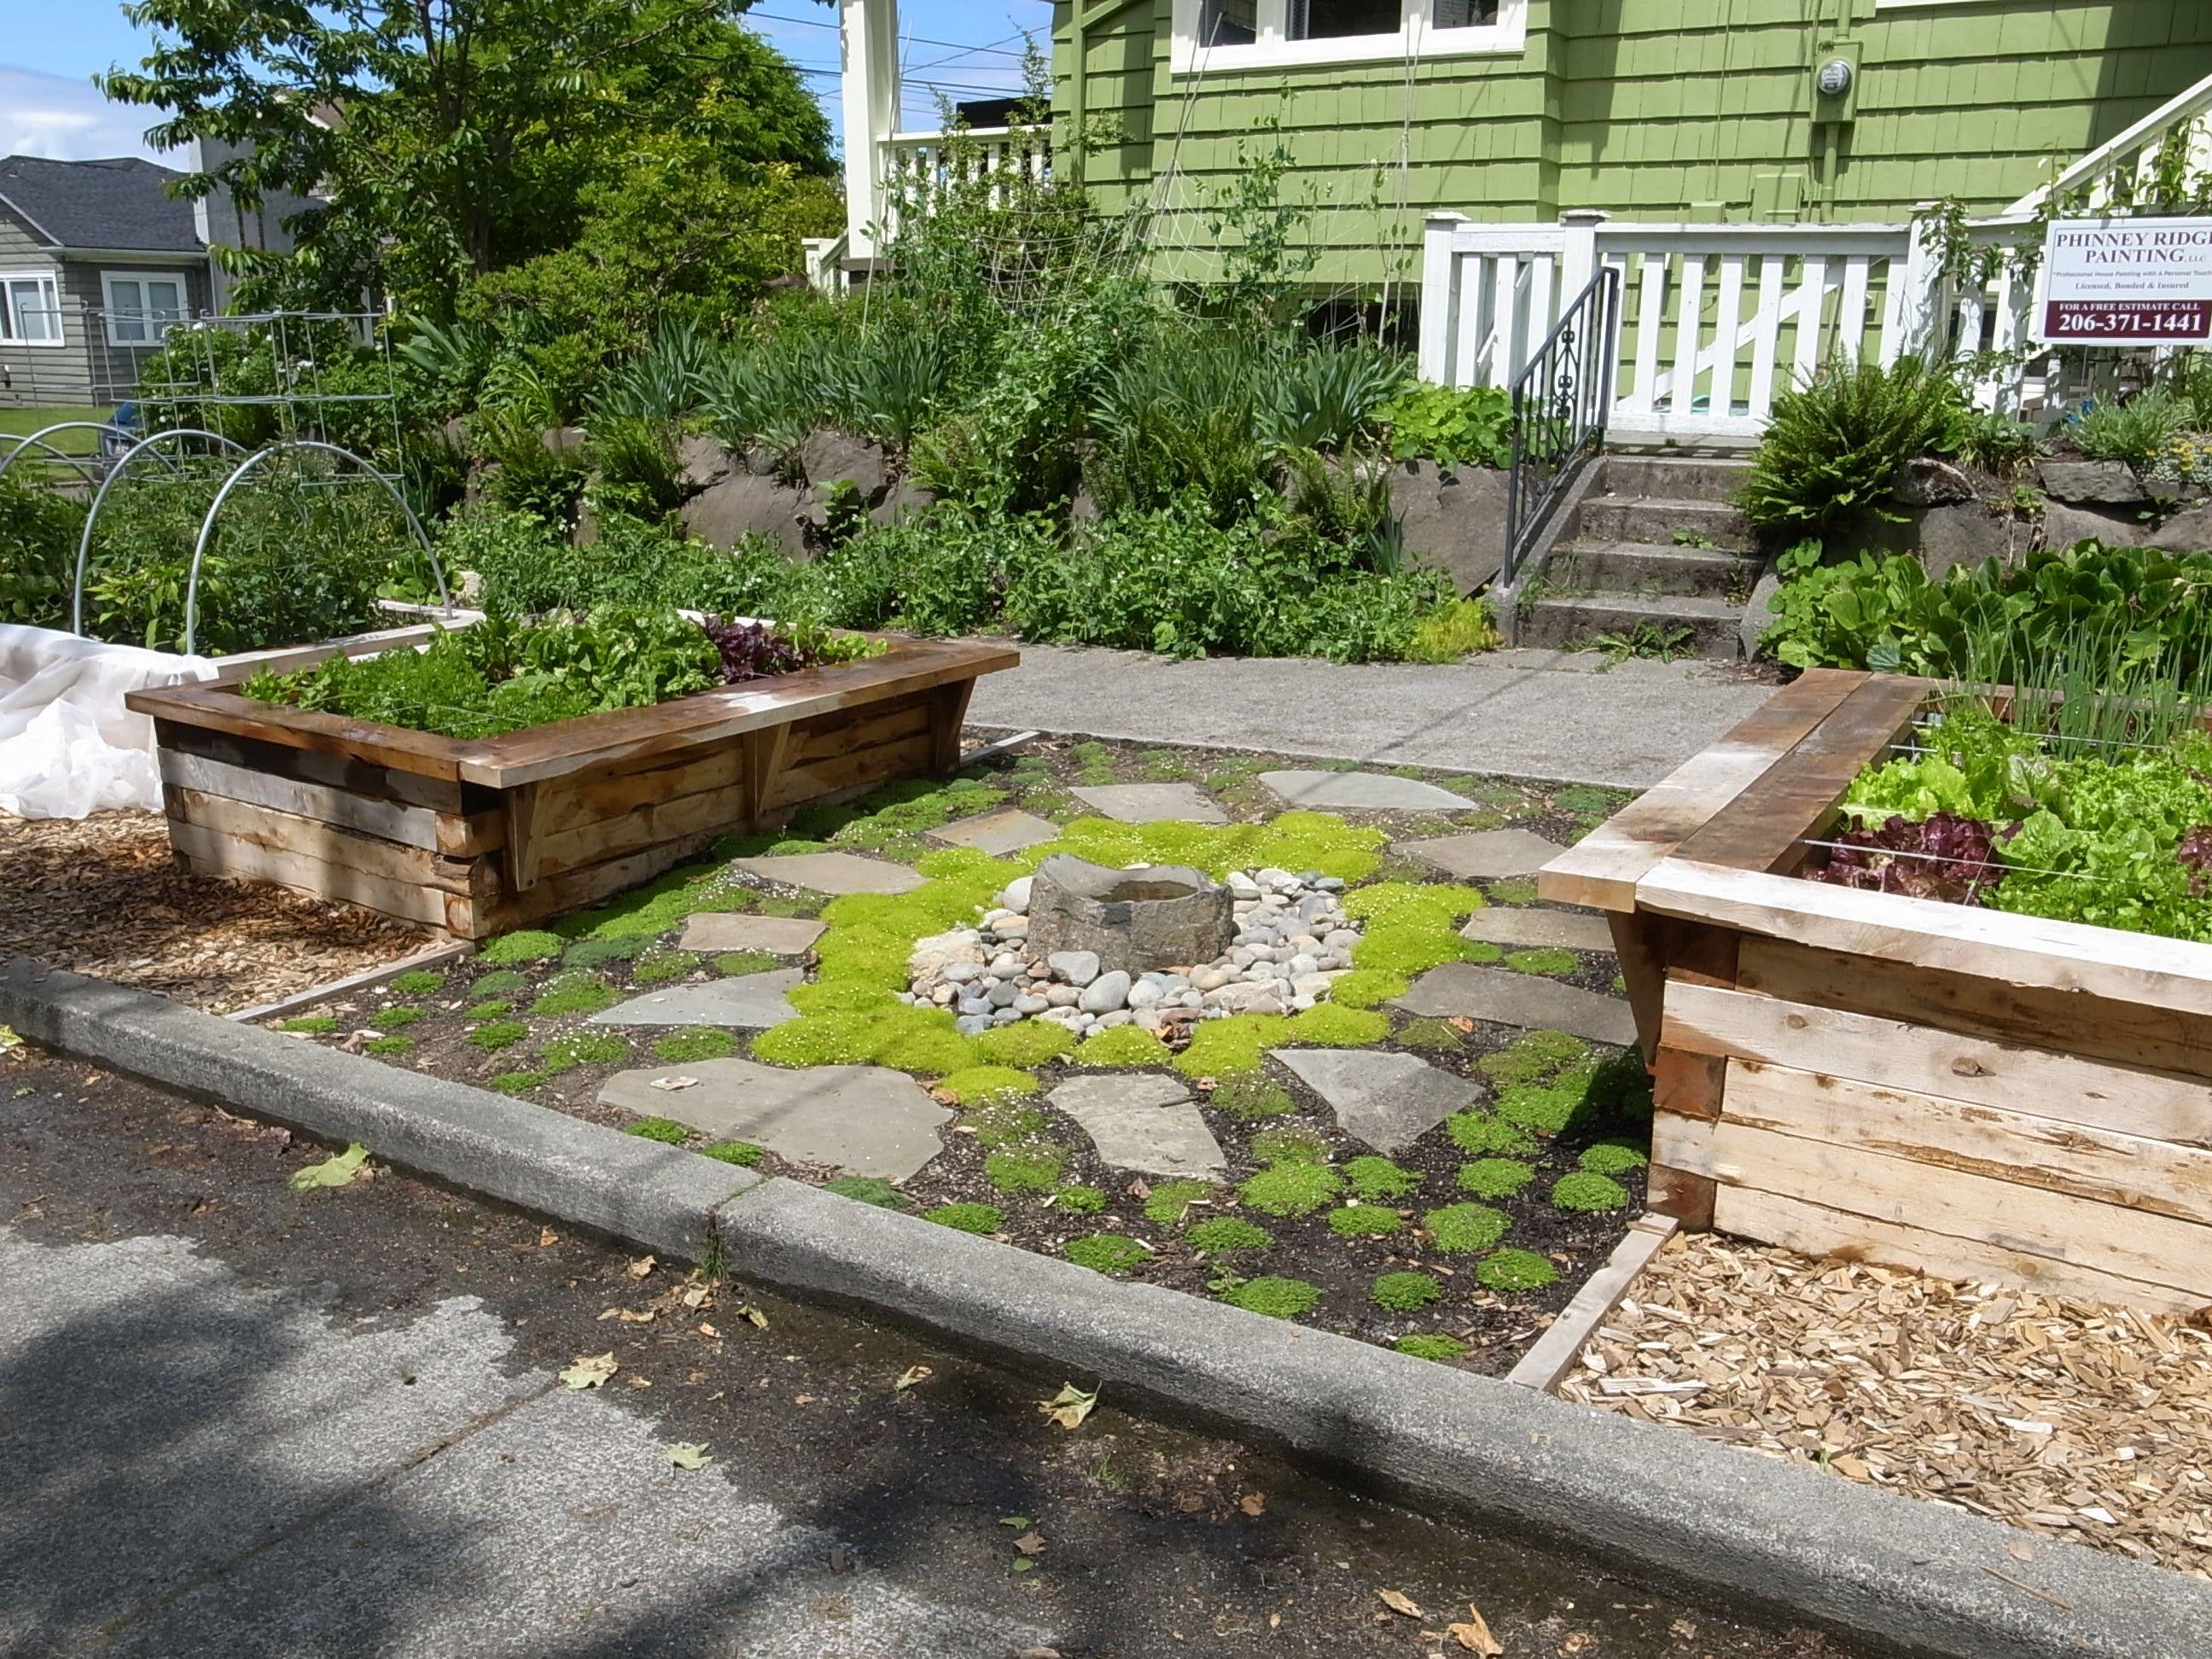 Summer Growing Raised Vegetable Beds Front Yard Garden Design